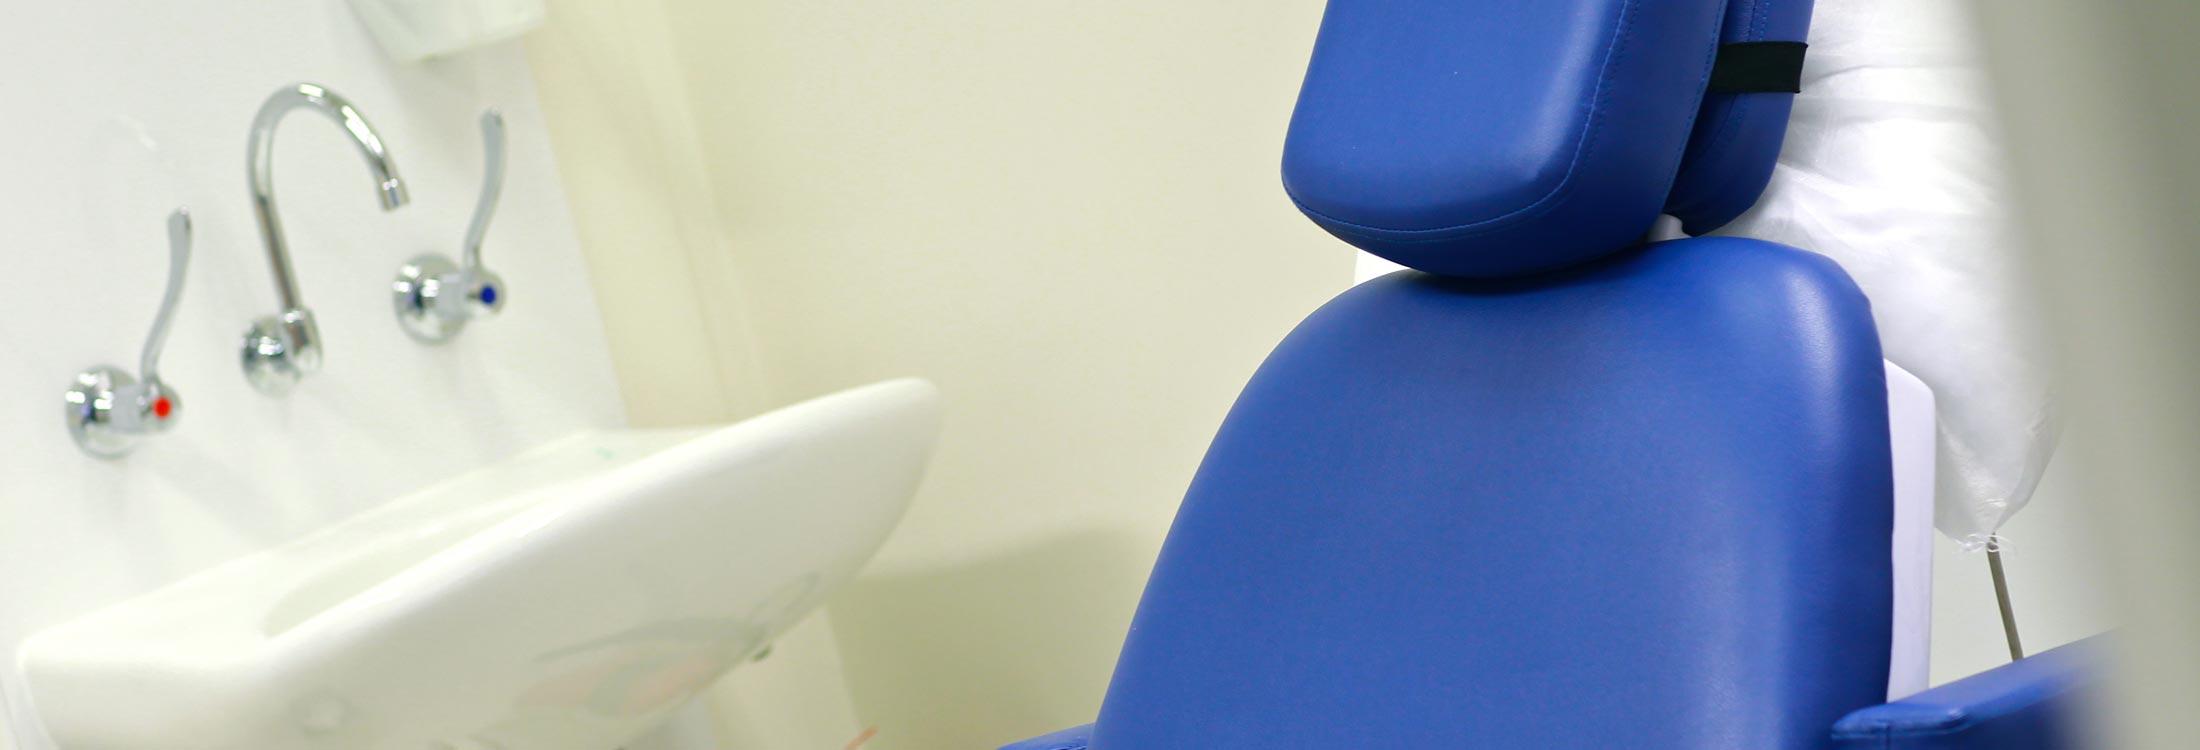 Radien Dermatology Procedure Room